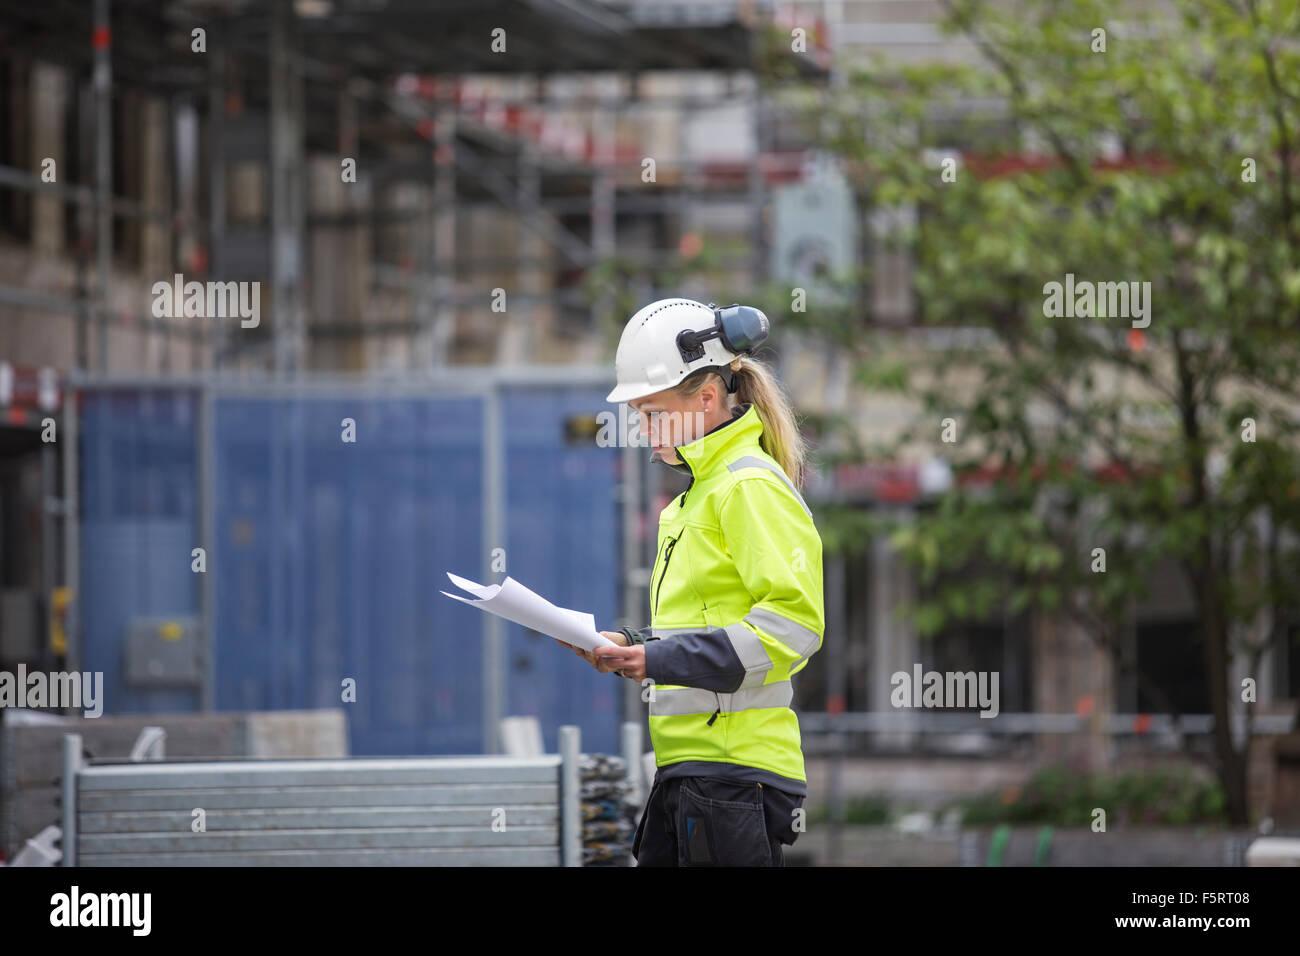 Sweden, Vastergotland, Construction worker looking at blueprints - Stock Image